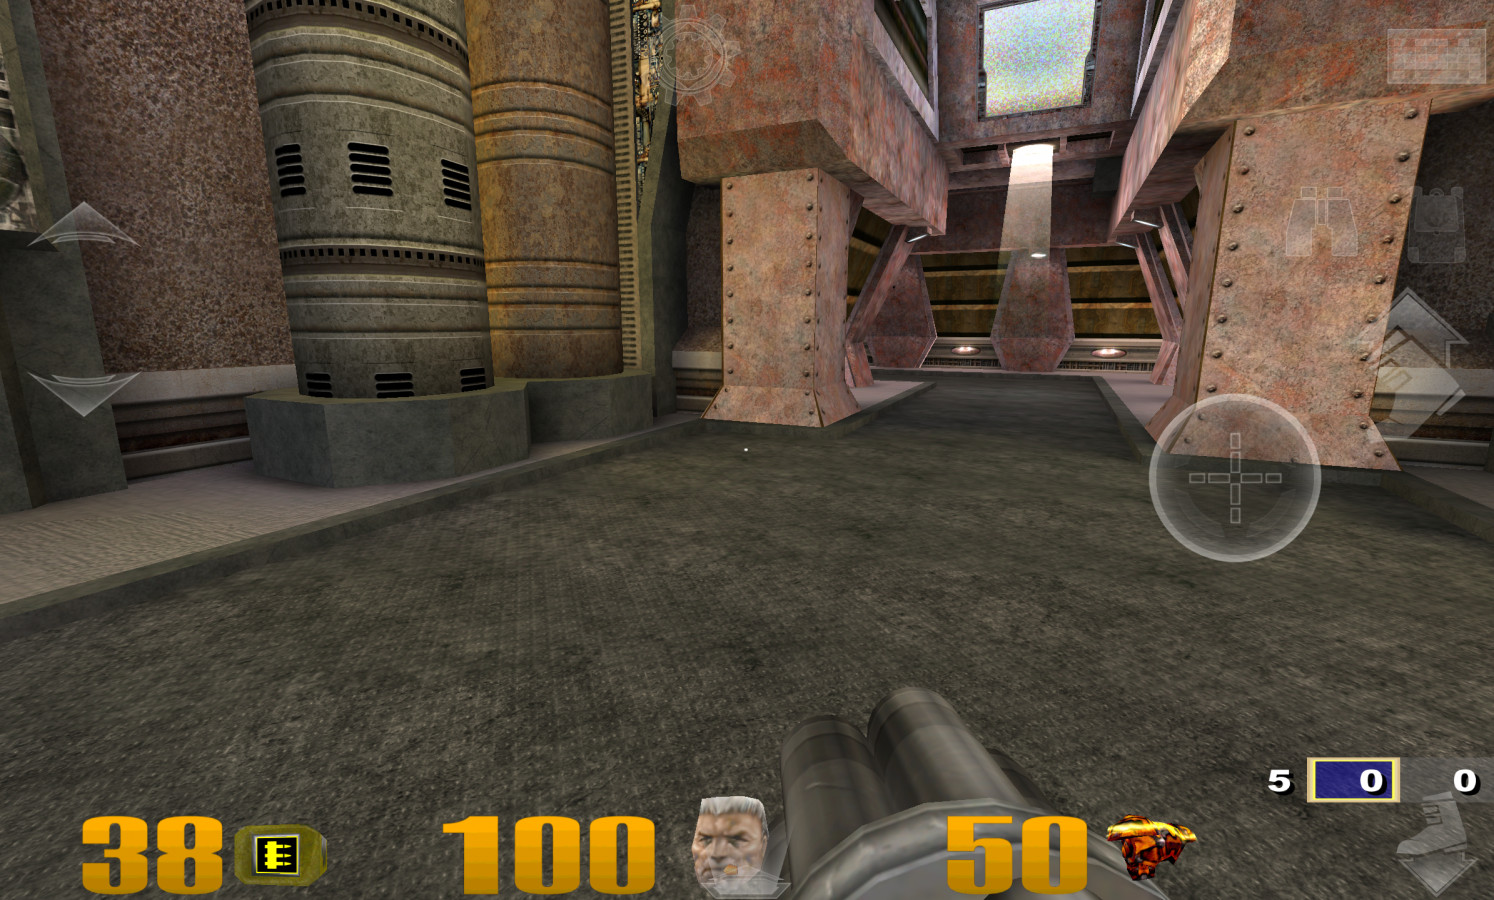 Quake 2 android apk download